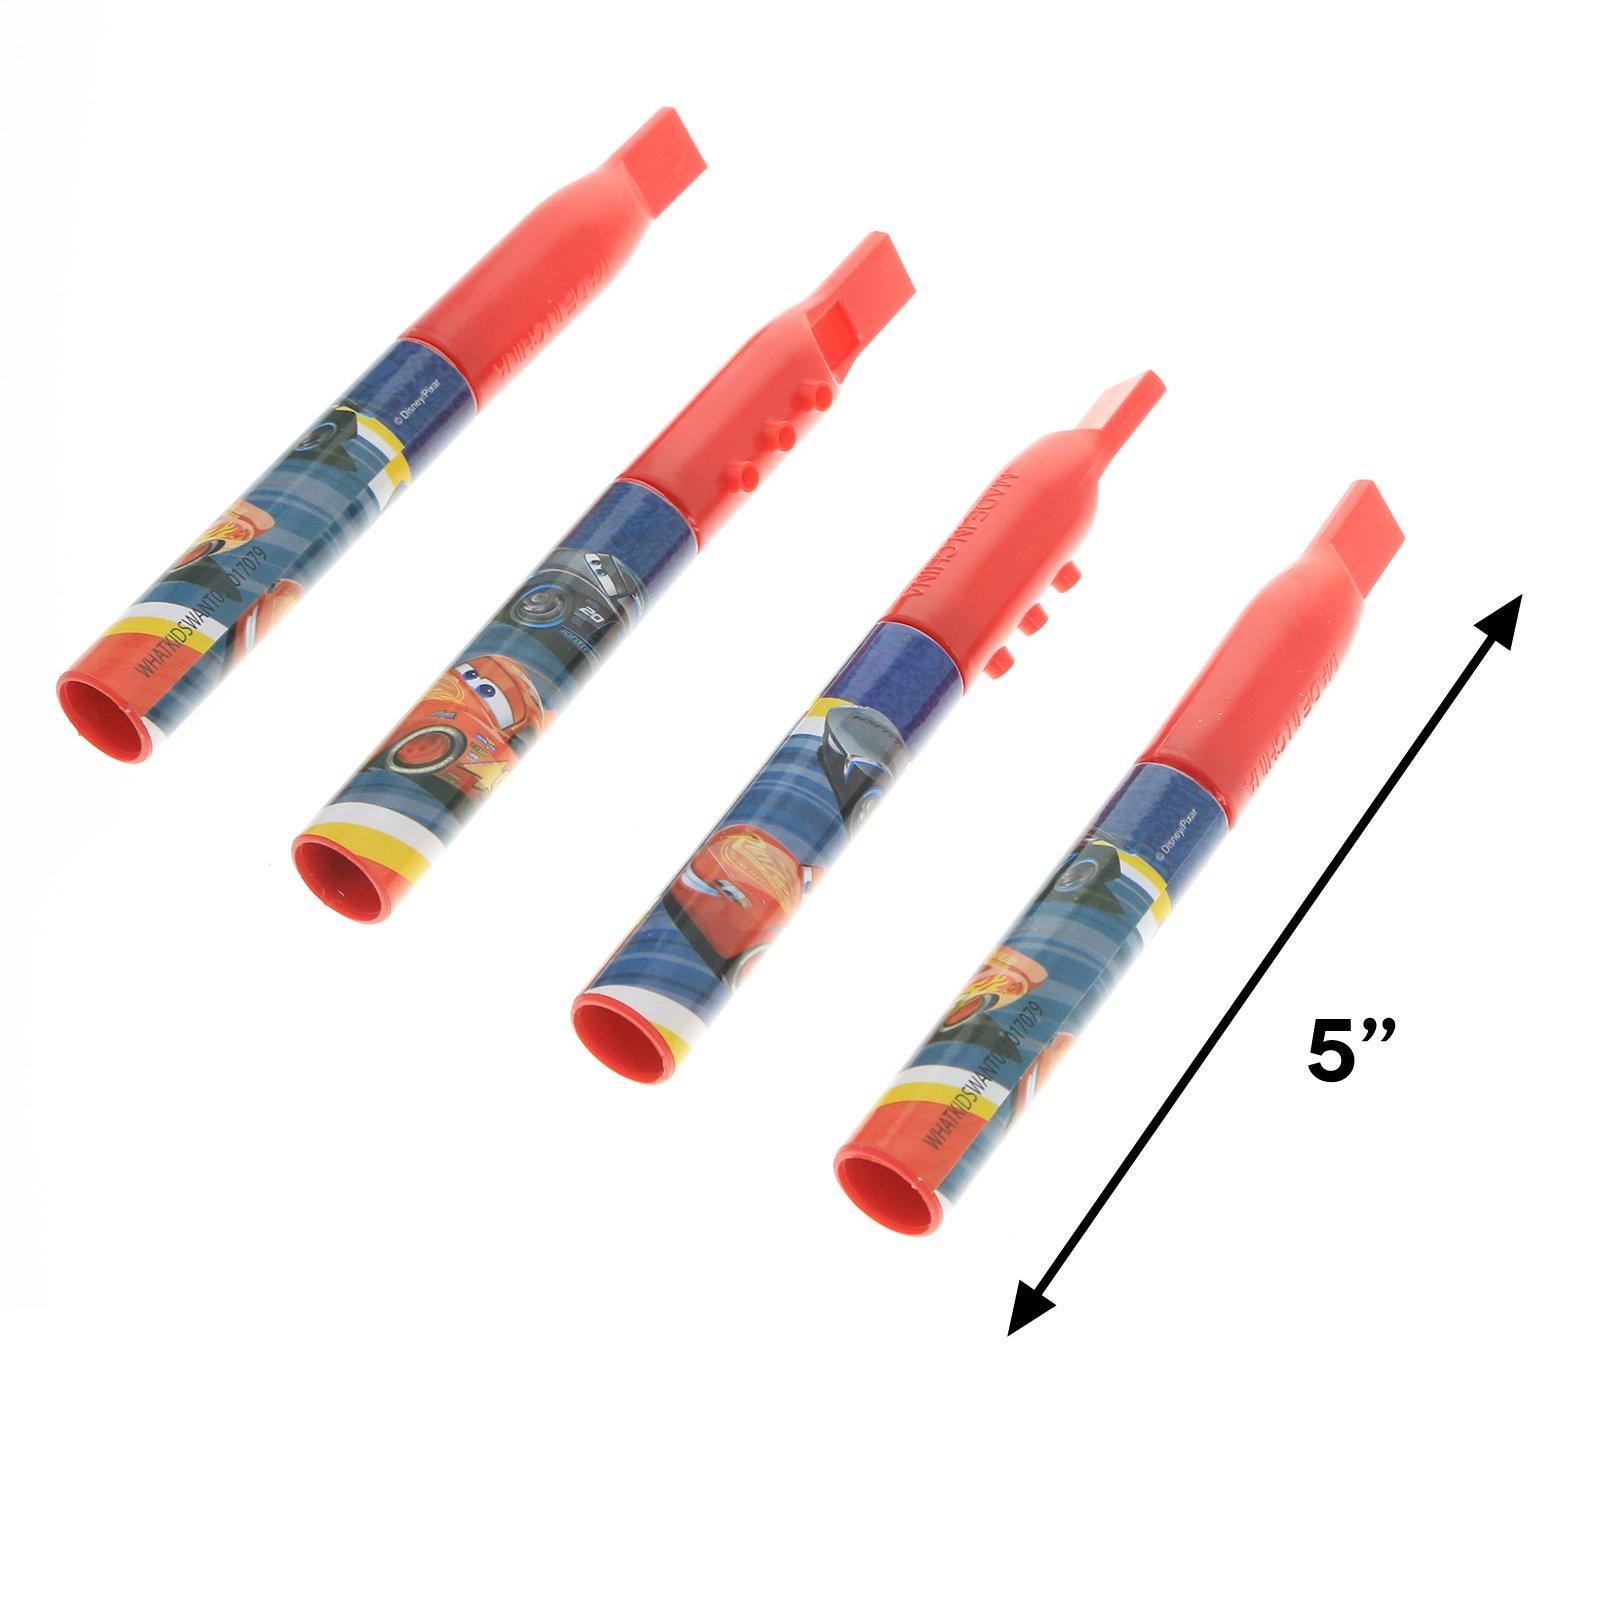 Disney Pixar Cars 3 Mini Flute 4 Pack Kids Musical Instrument Toy - Red